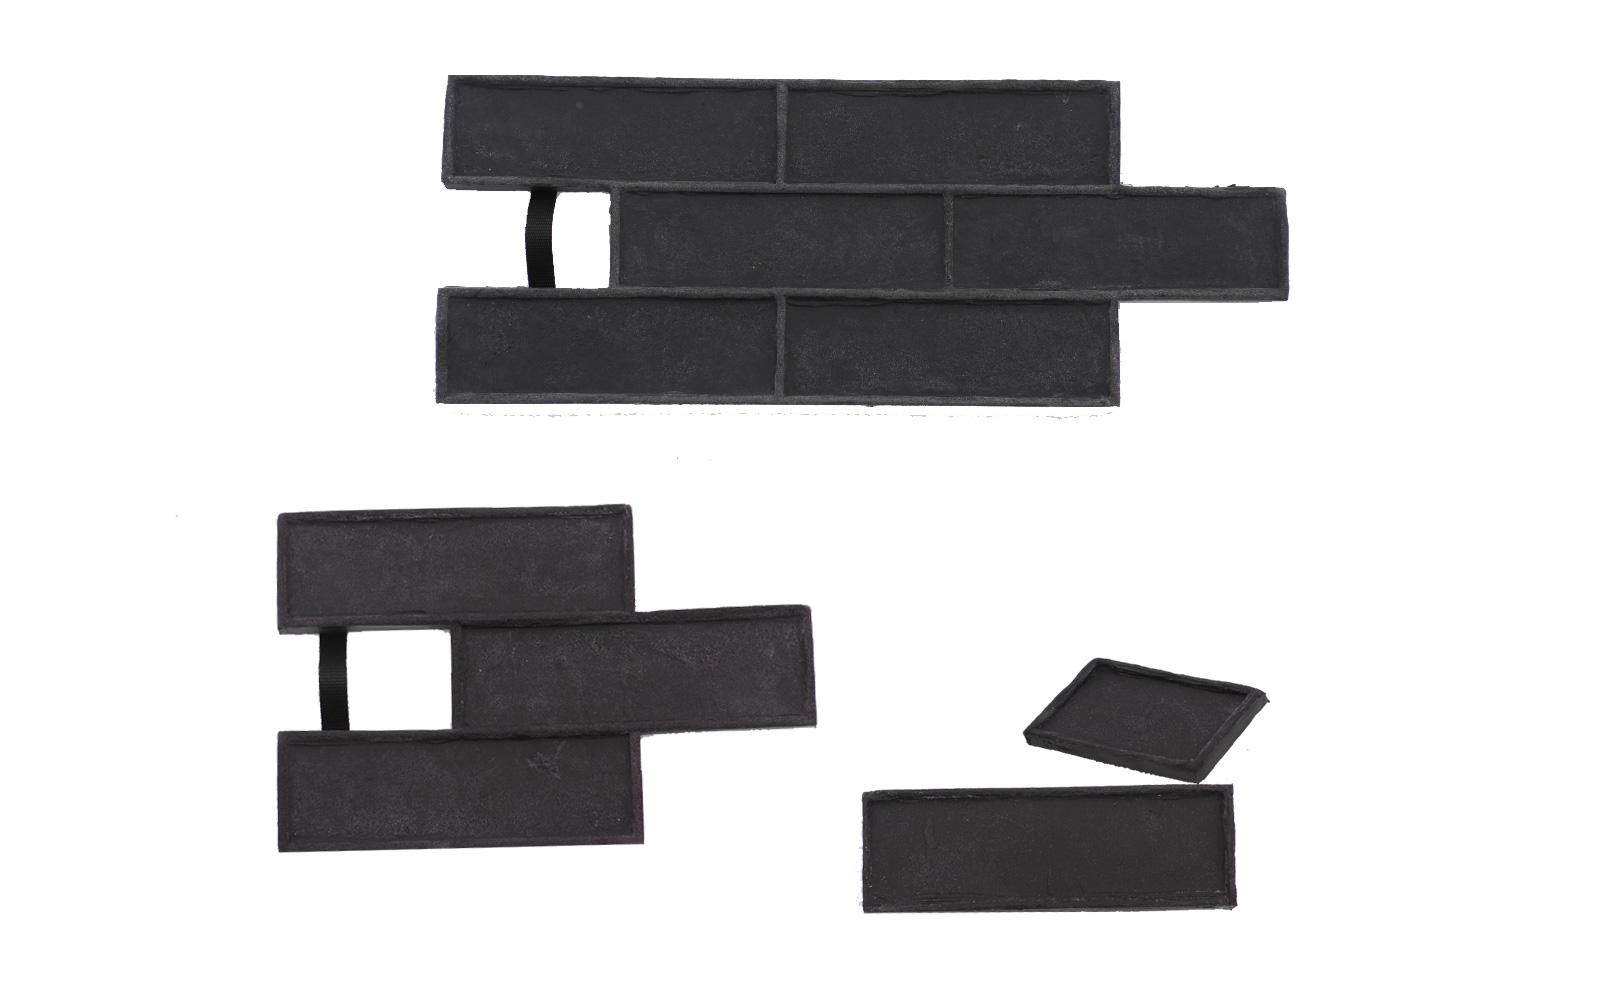 STAMP® Tehla Decent SET2 - 4 profesionálne raznice na výrobu obkladu 4 ks td0,5+1 a td3 a td6